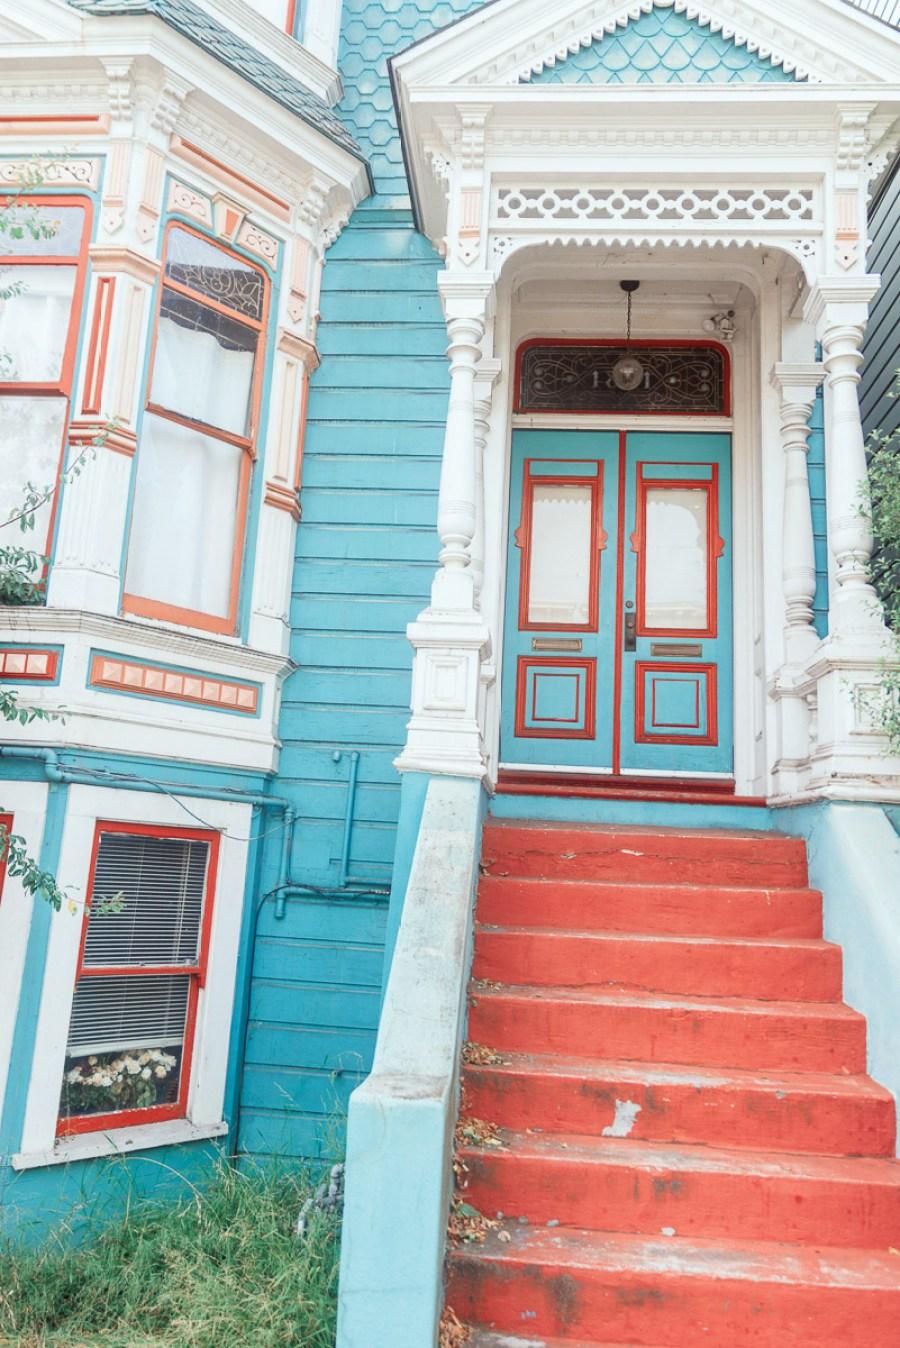 San Francisco 2016 U.S.A. America Holidays-26